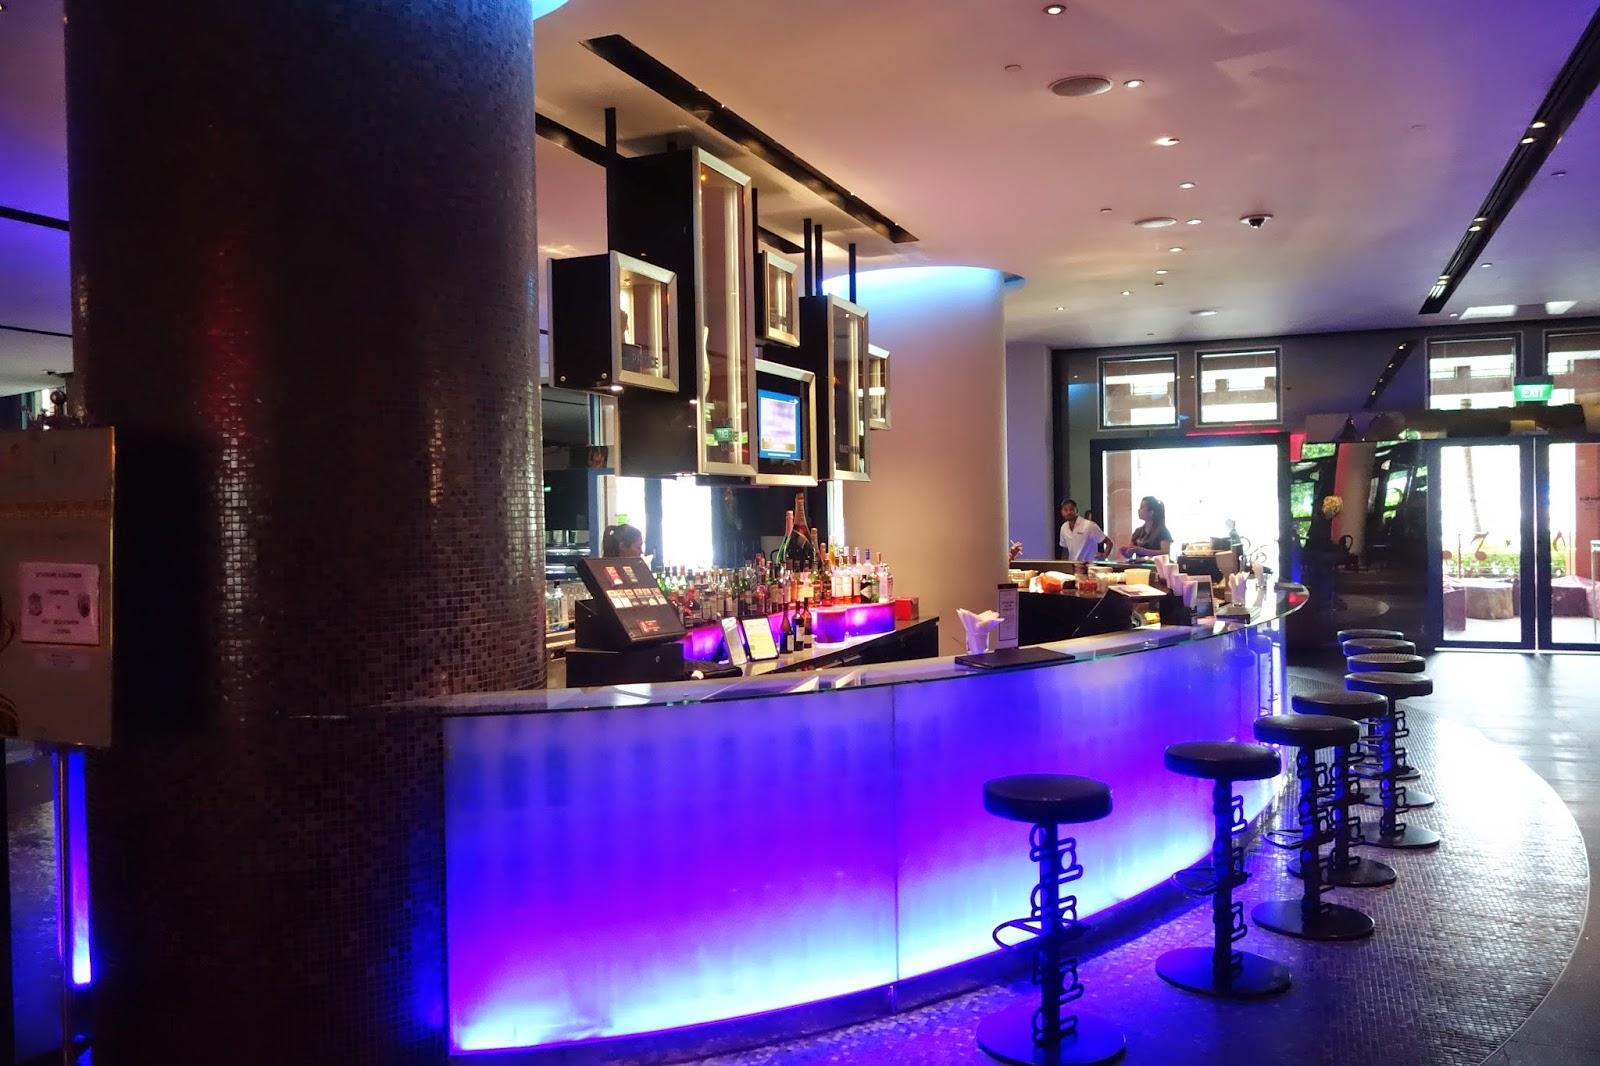 guitar 123 singapore food and travel blog! : starz restaurant